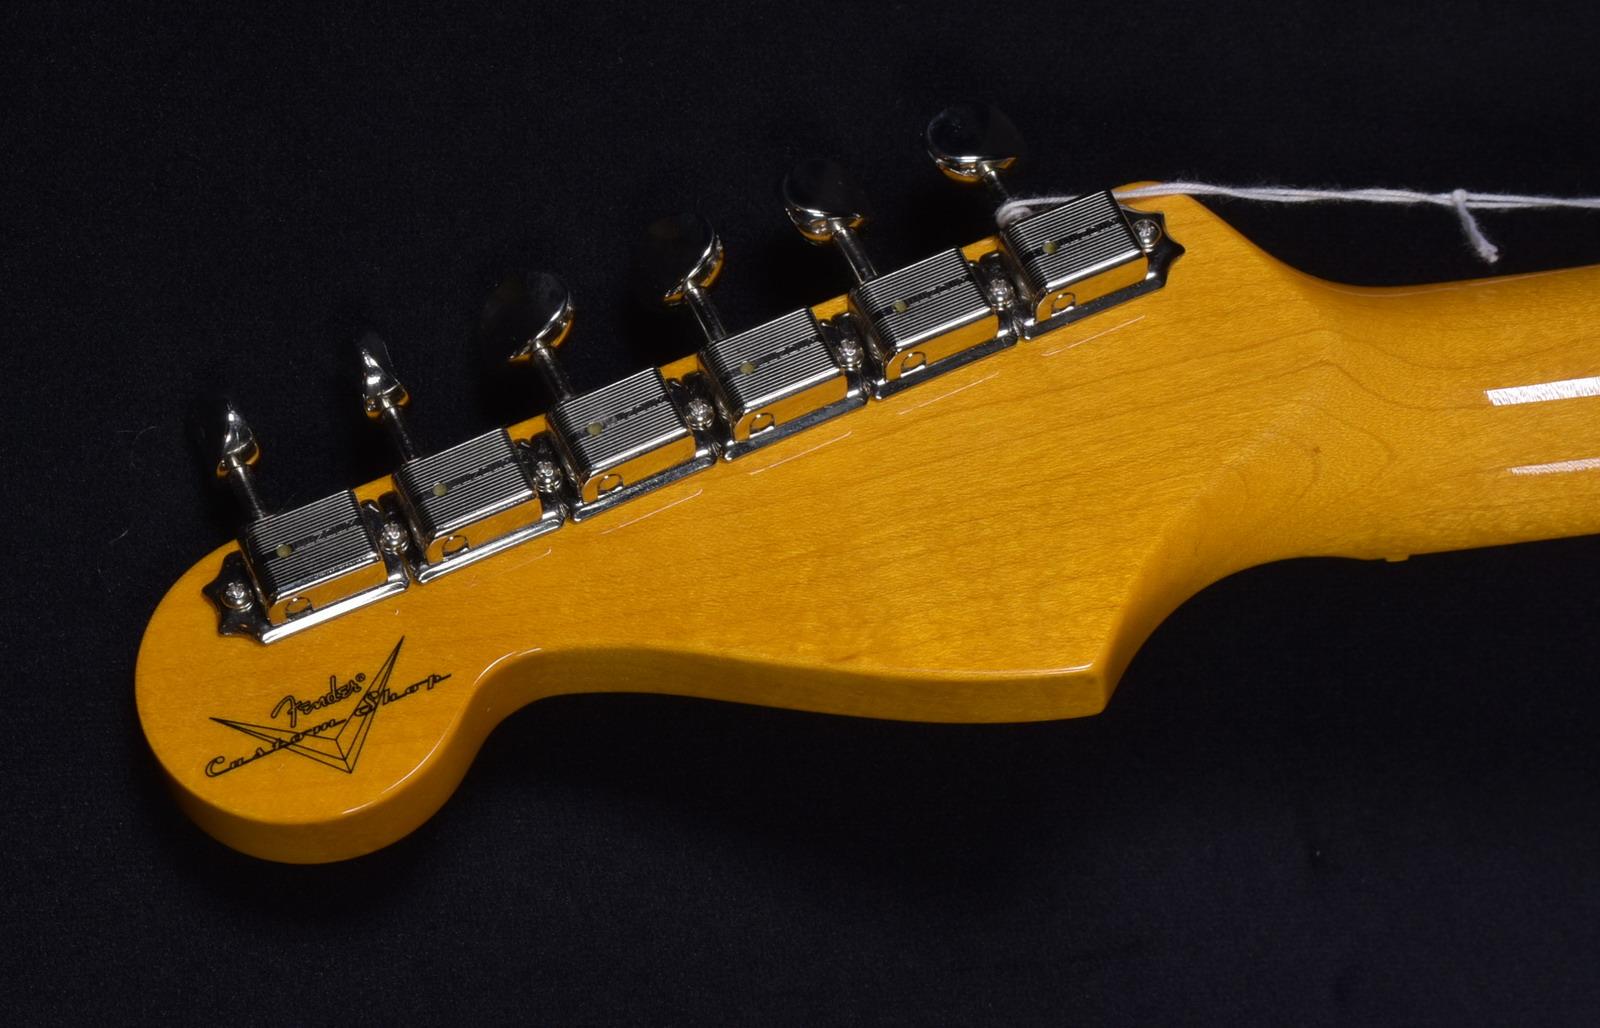 SOLD C SHOP DAVID GILMOUR SIGNATURE STRAT NOS | Gbl Guitars